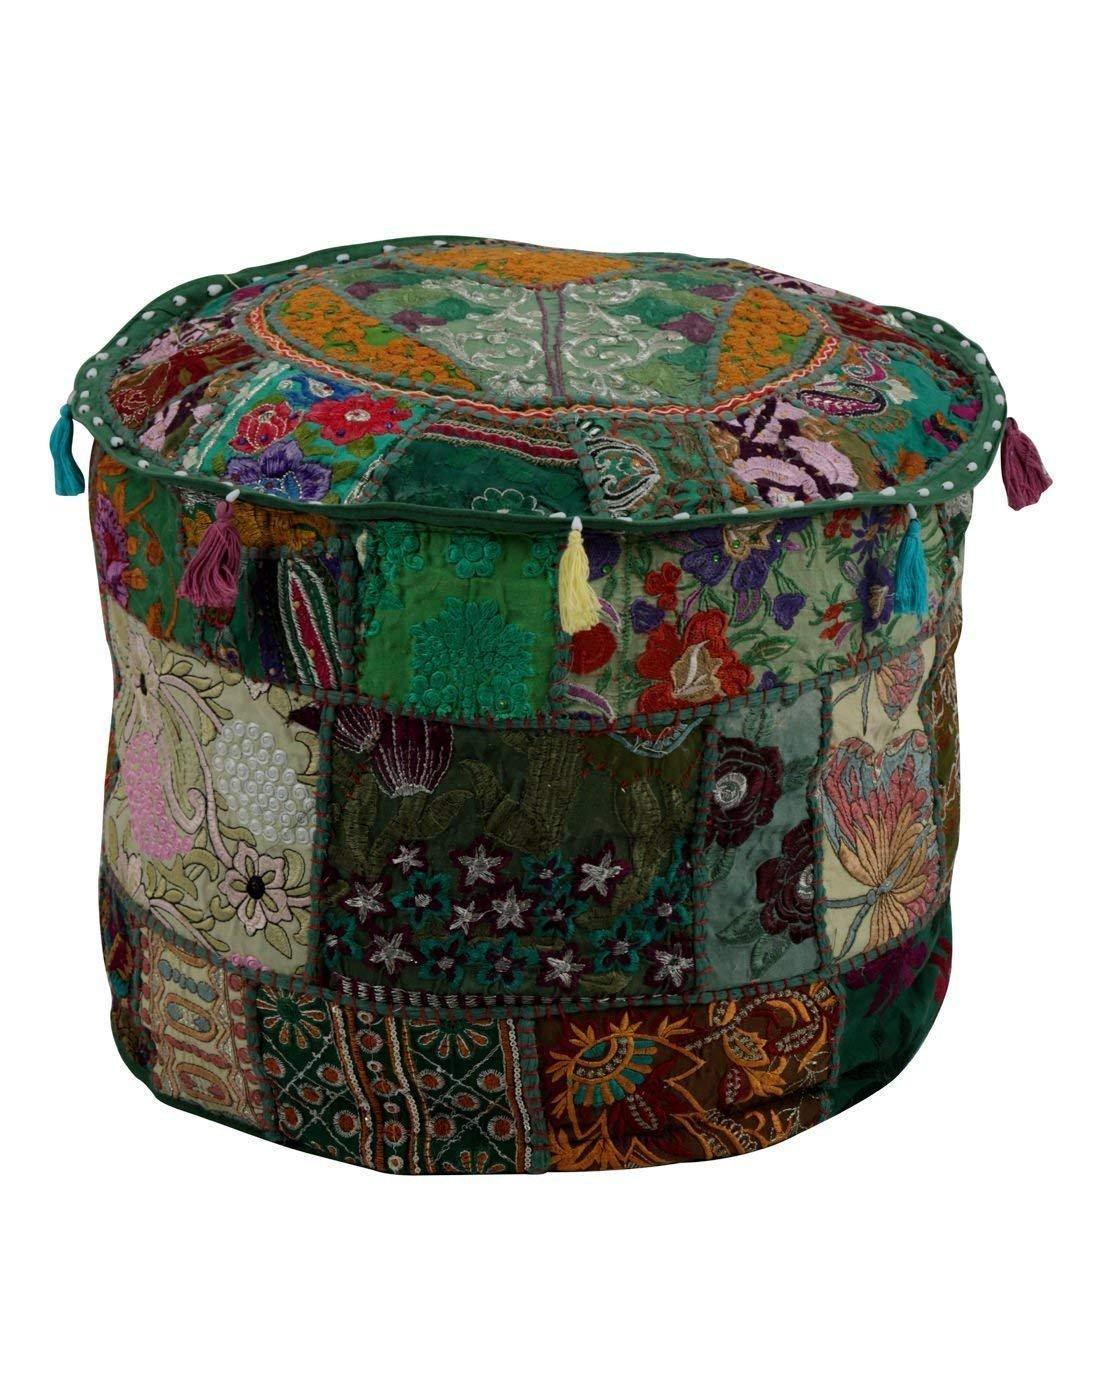 GANESHAM Indian Home & Living Decor Hippie Patchwork Bean Bag Boho Bohemian Hand Embroidered Ethnic Handmade Pouf Ottoman Vintage Cotton Floor Pillow & Cushion 13'' H x 18'' Diam.